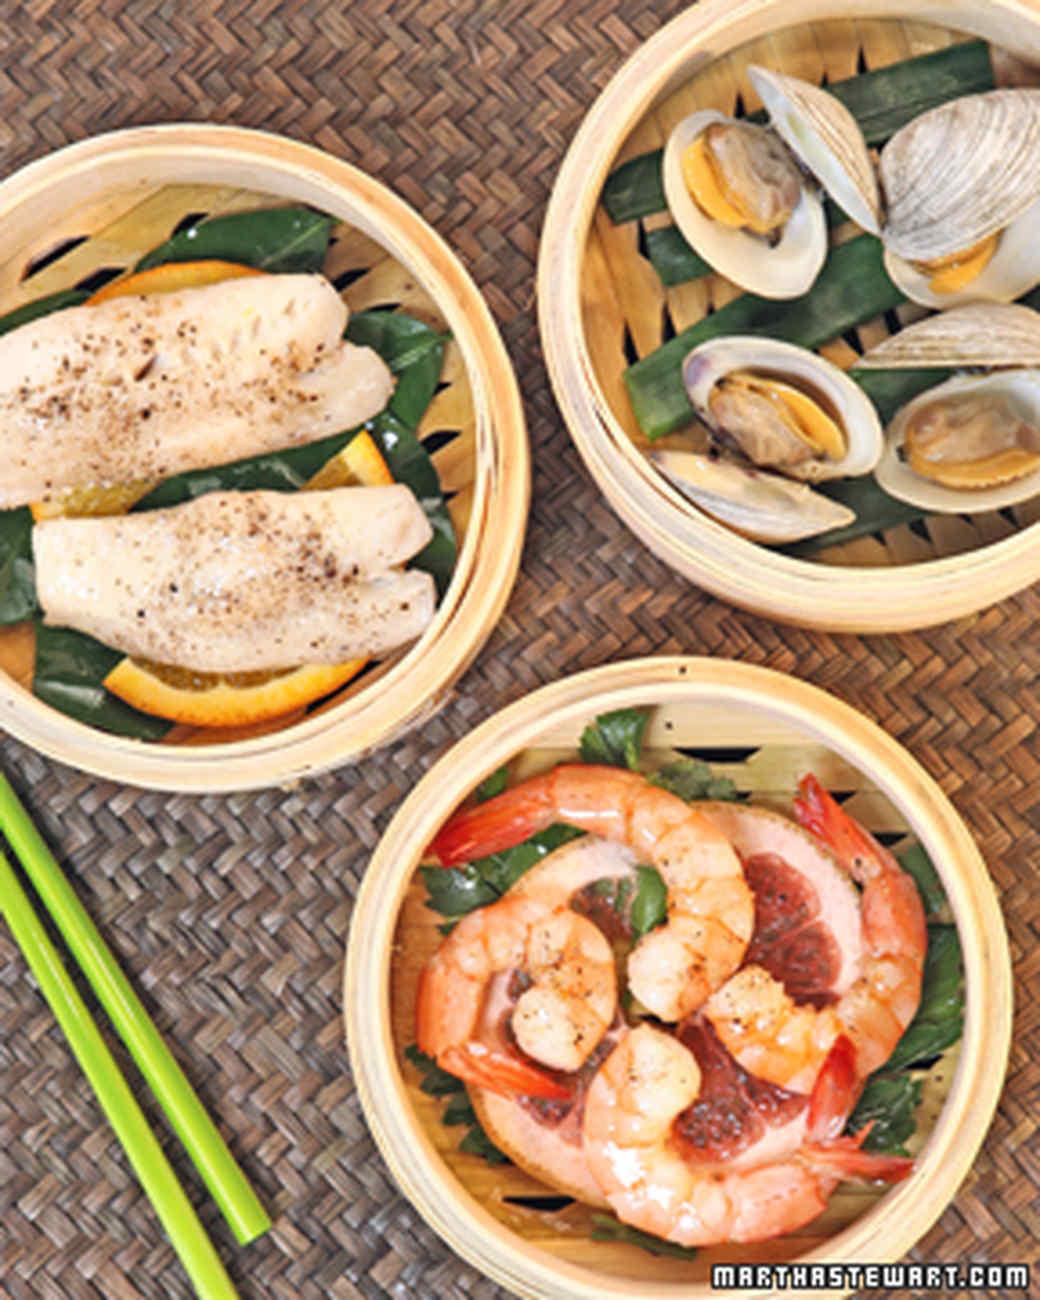 Steamed Seafood Medley